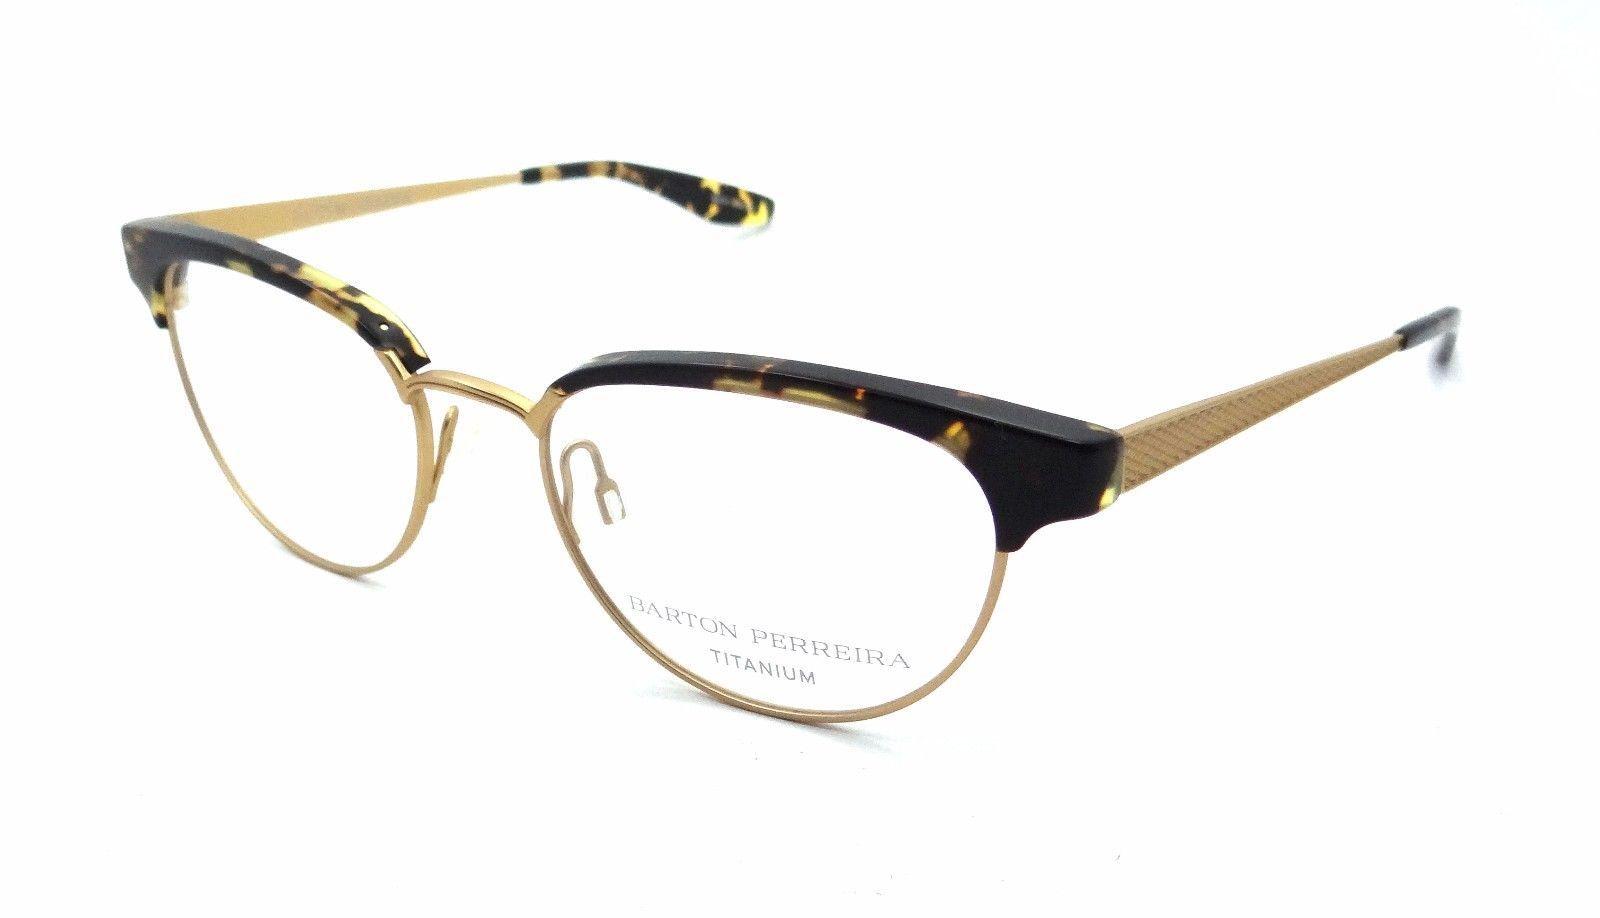 69f76dd1fd Barton Perreira RX Eyeglasses Frames Filly and 27 similar items. S l1600